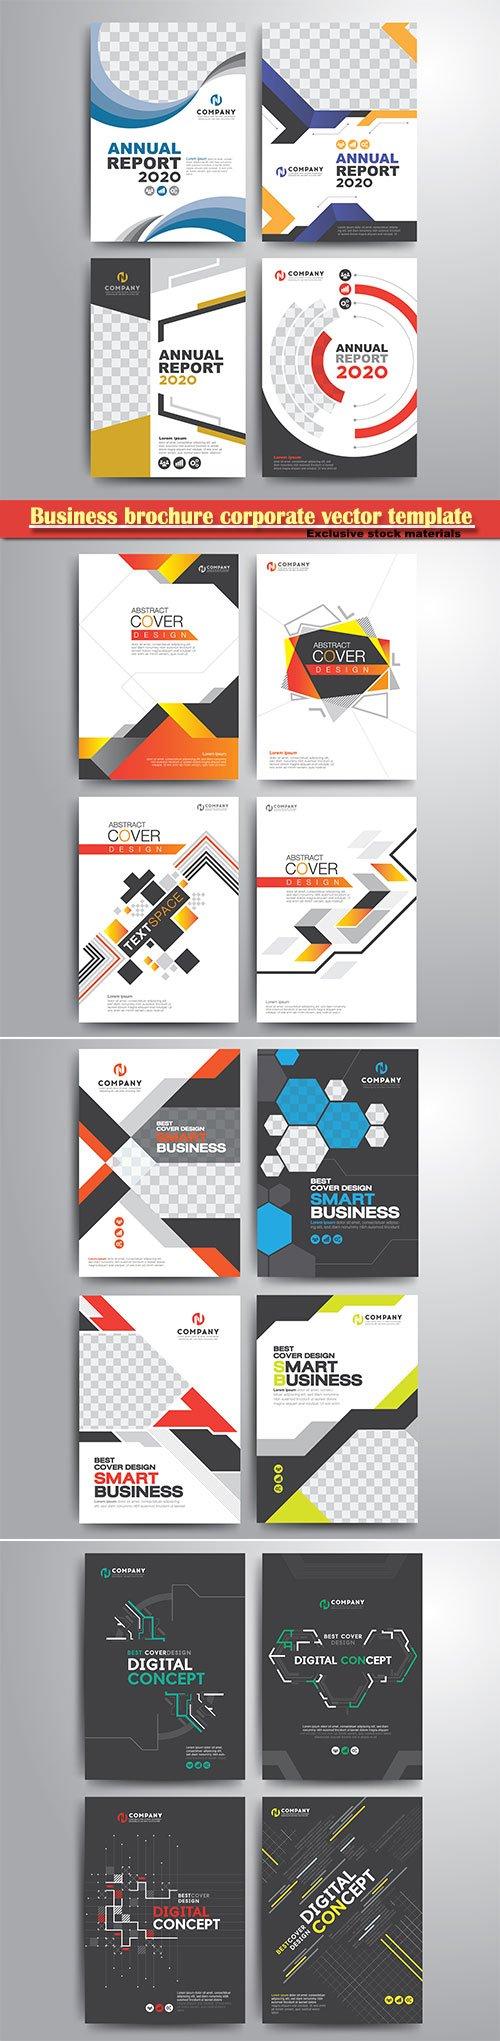 Business brochure corporate vector template, magazine flyer mockup # 10